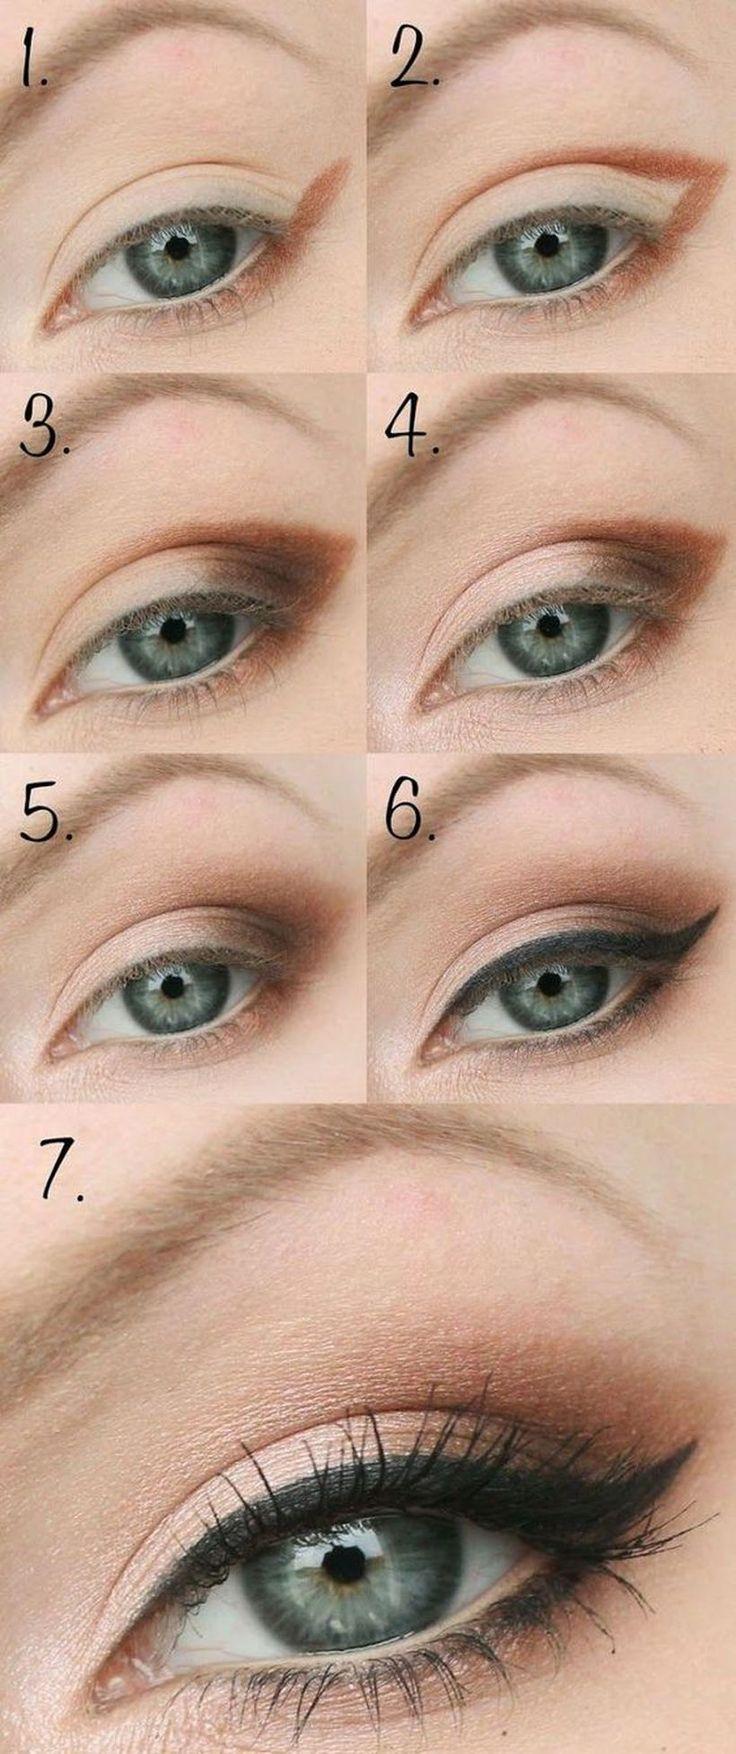 20 Fabulous Look Natural Green Eyes Makeup https://fasbest.com/20-fabulous-look-natural-green-eyes-makeup/